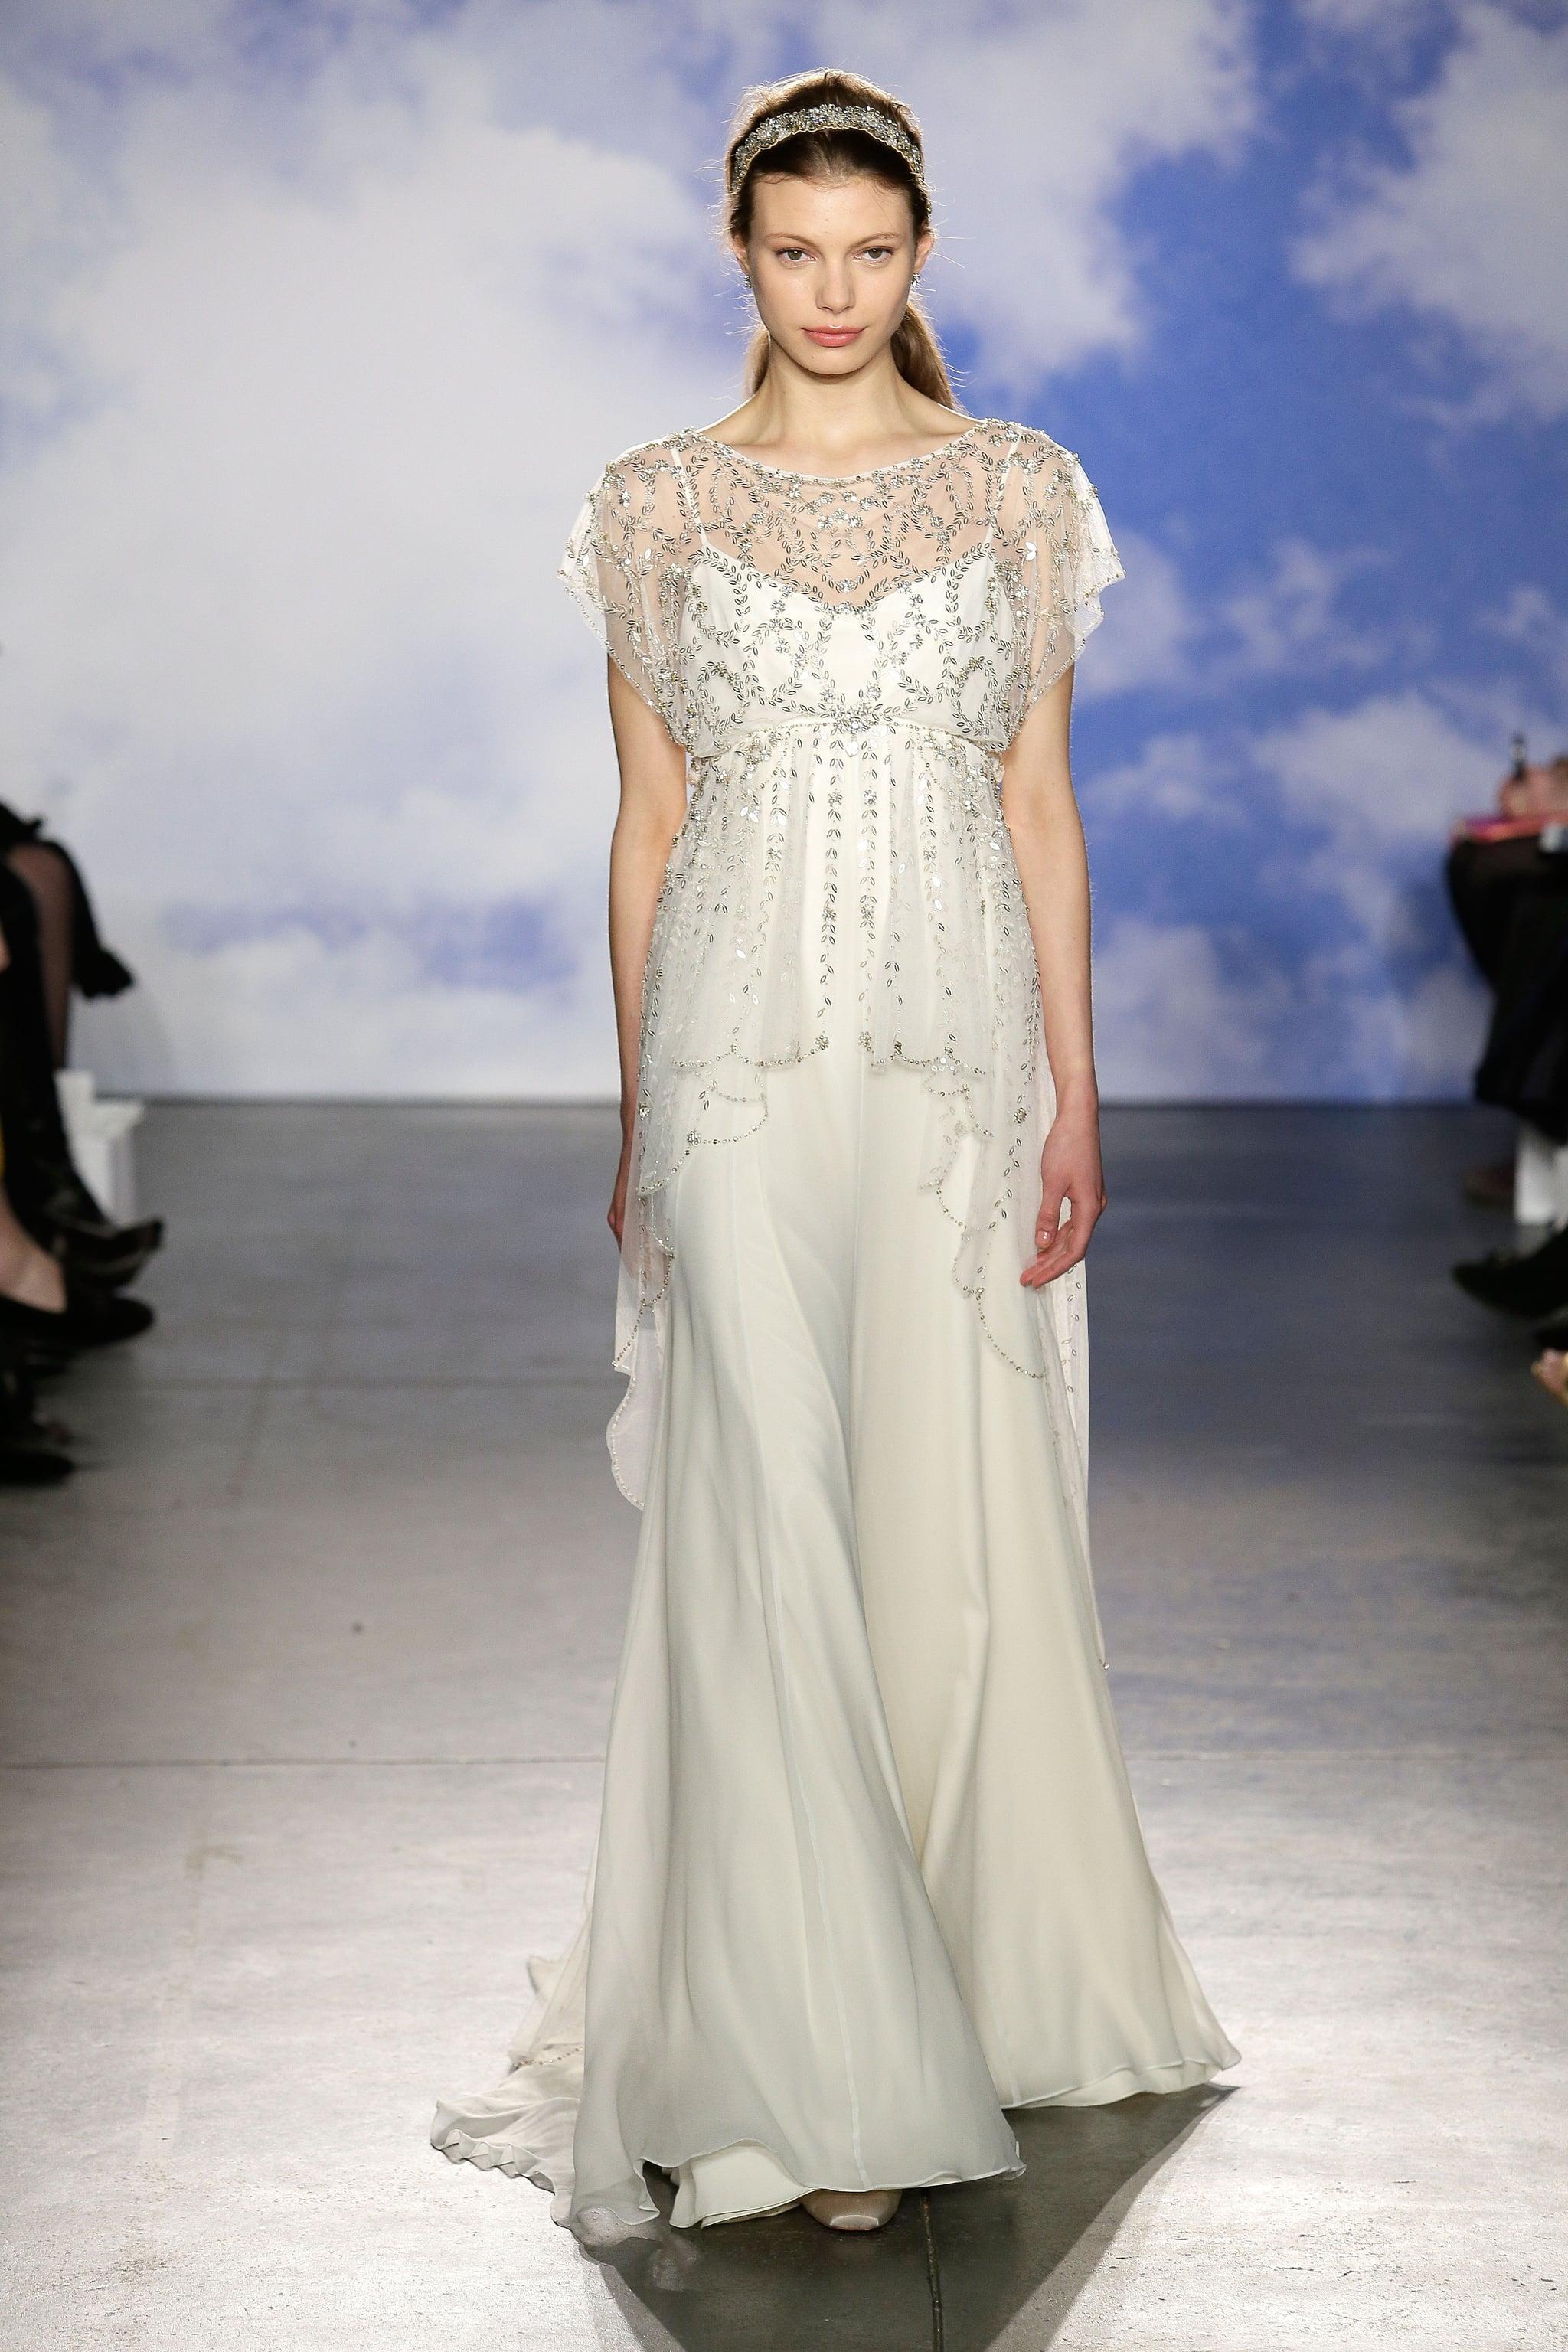 Jenny Packham Bridal Spring 2015